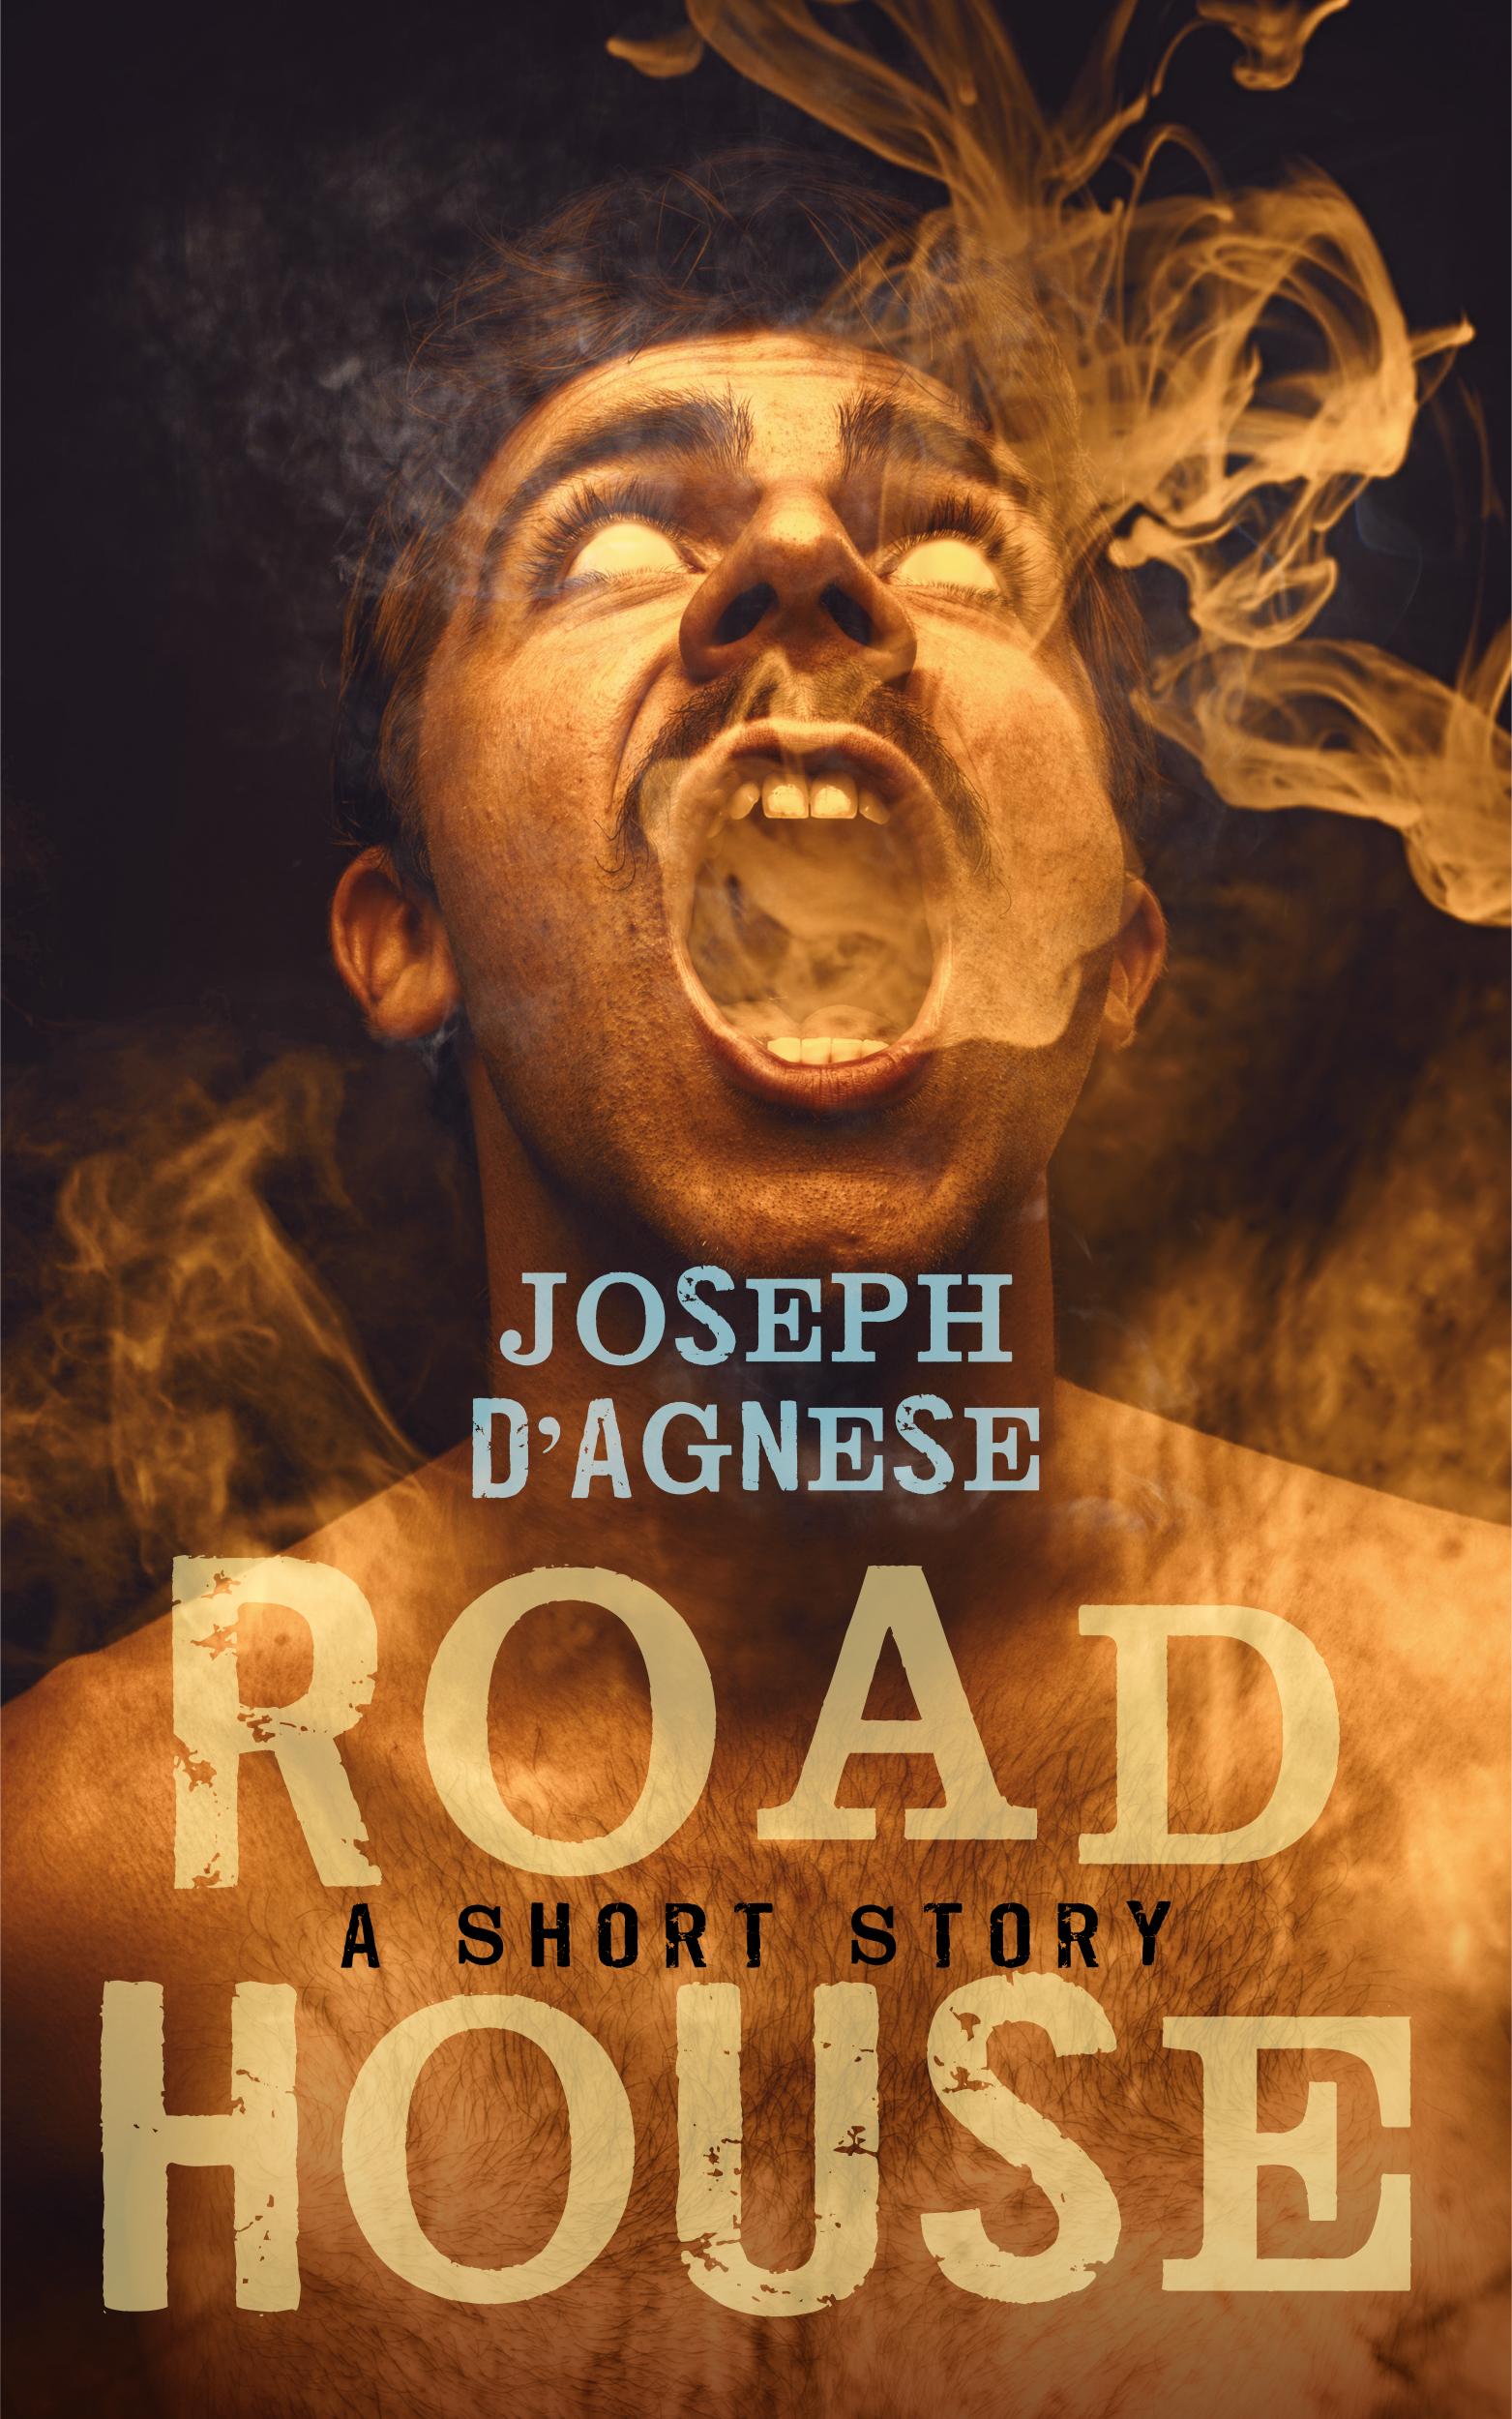 Roadhouse by Joseph D'Agnese